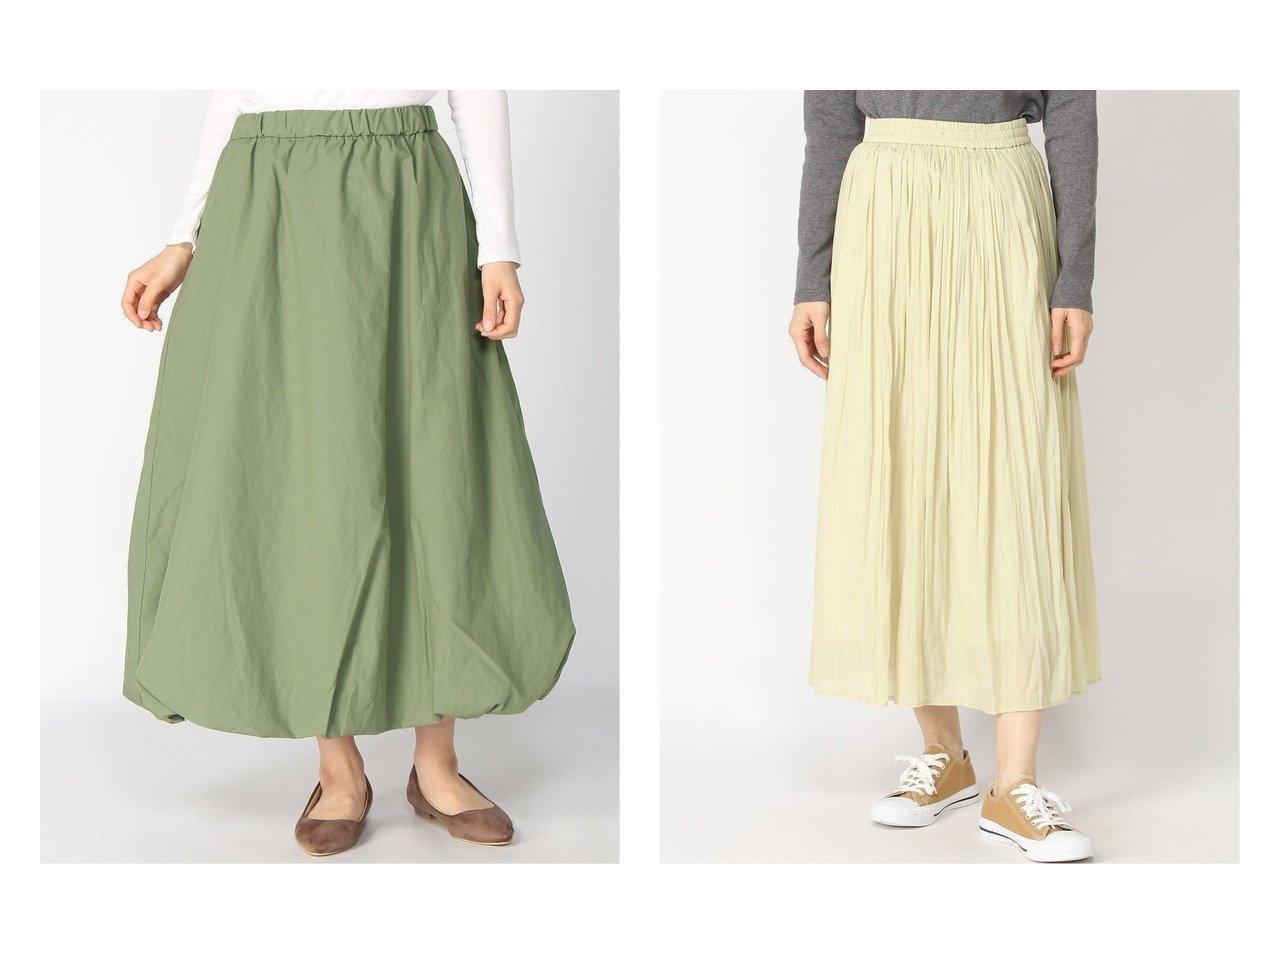 【BAYFLOW/ベイフロー】のプリーツロングSK&【niko and…/ニコアンド】のリネンコンバルーンSK 【スカート】おすすめ!人気、トレンド・レディースファッションの通販    レディースファッション・服の通販 founy(ファニー)